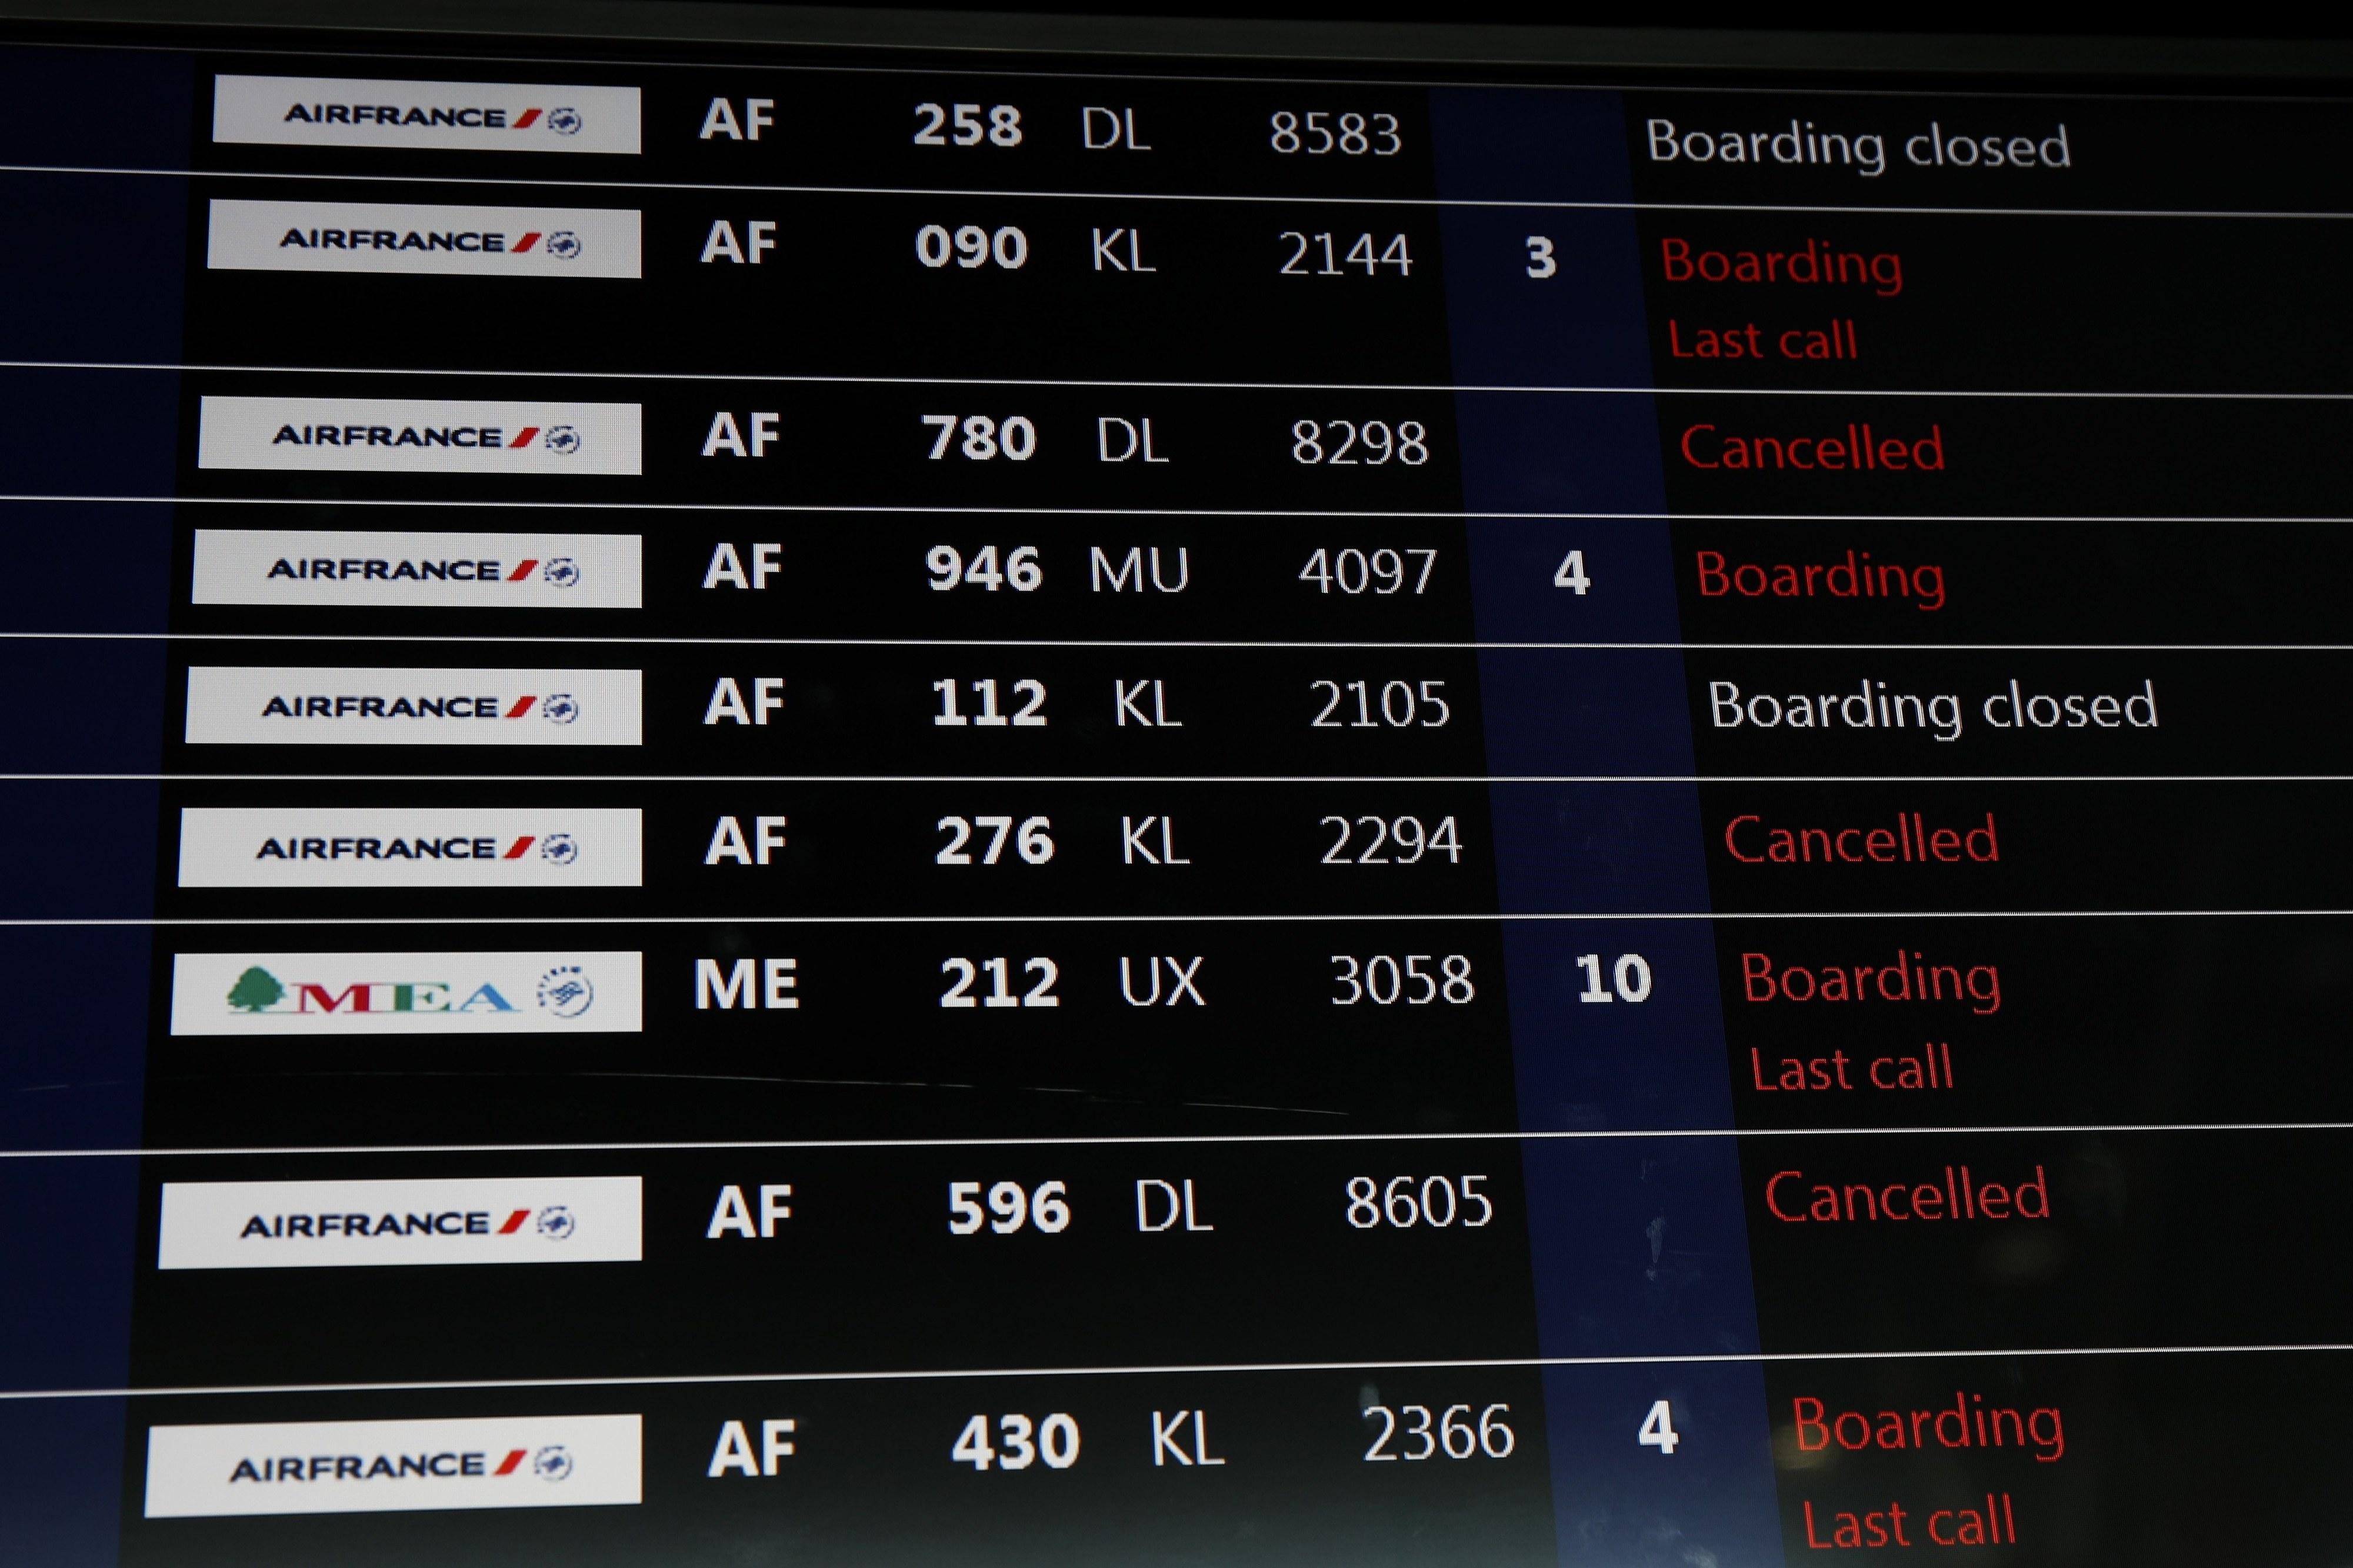 Air France cancela 25% dos voos de sexta-feira devido a greve